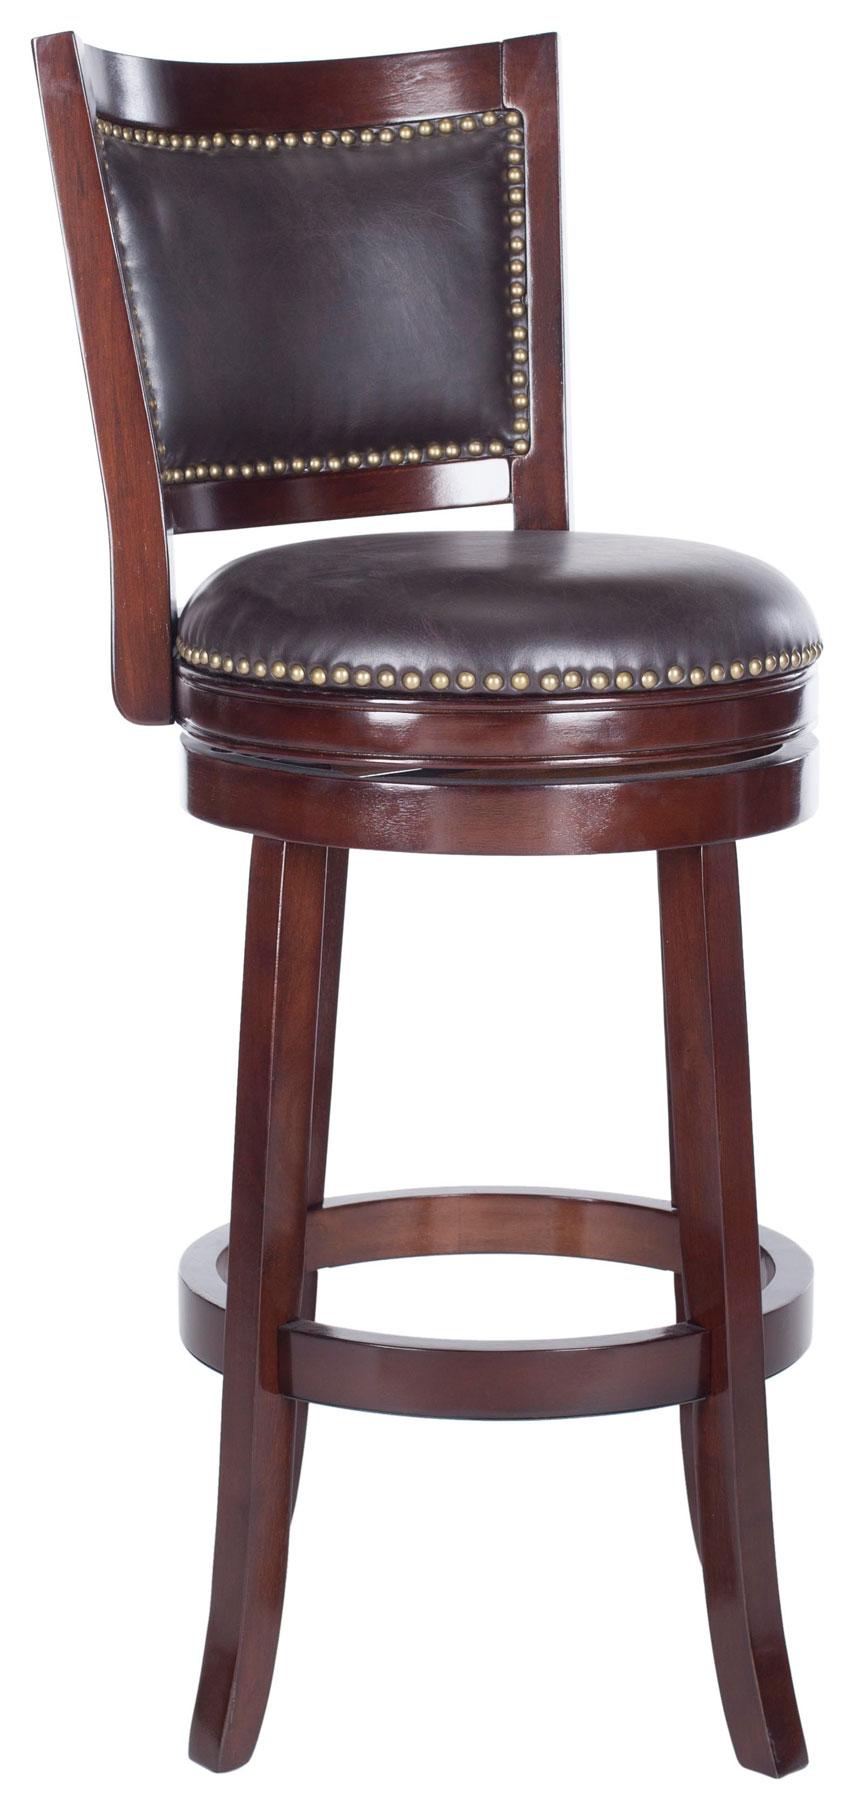 Fox7012a Bar Stools Furniture By Safavieh